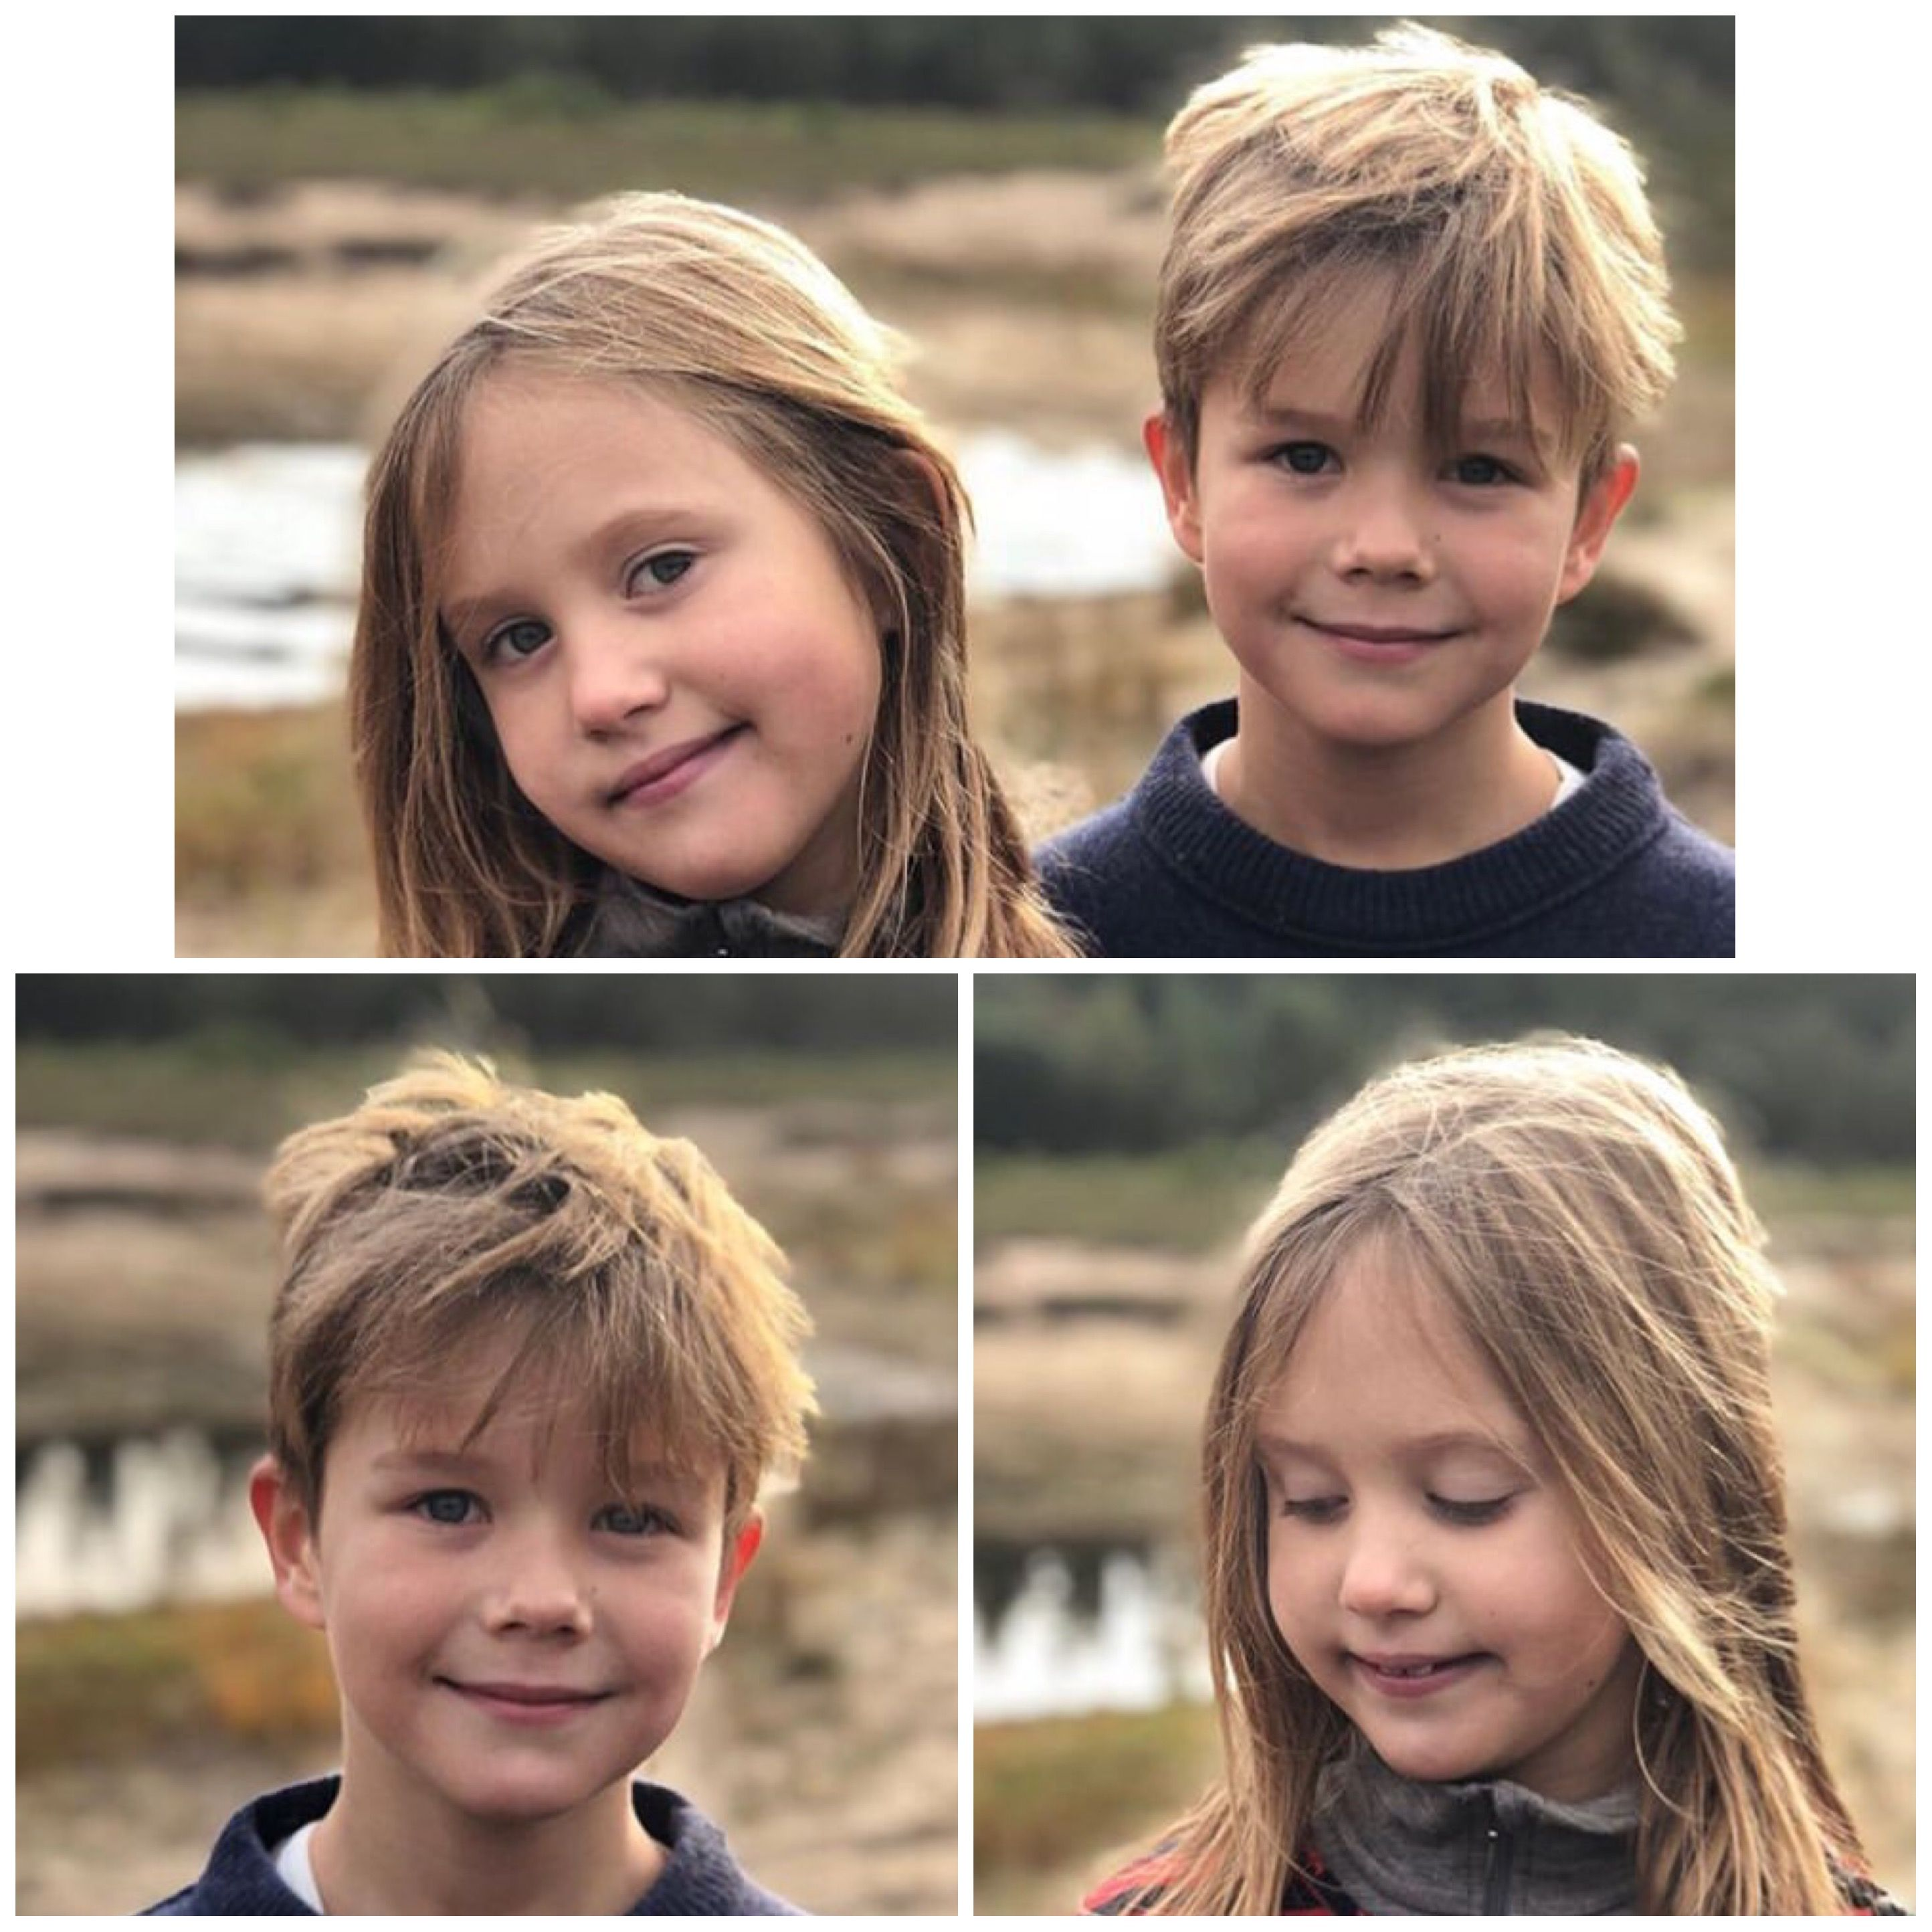 08/01-2018 The Danish Royal Twins Turn 8 Today. Happy